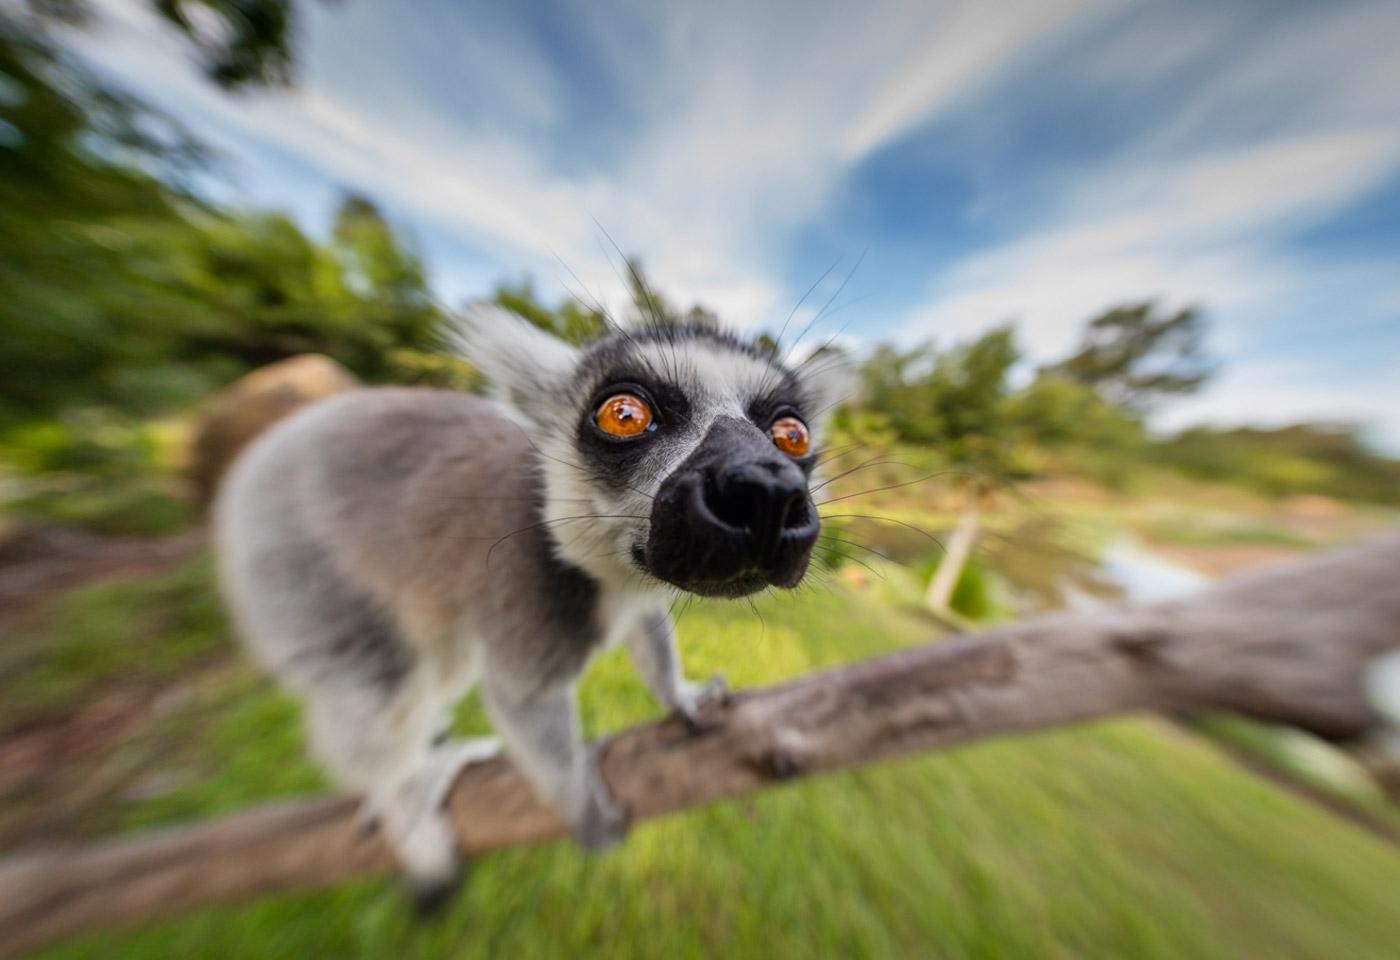 Australian Zoo Greg Sullavan Colin Baker